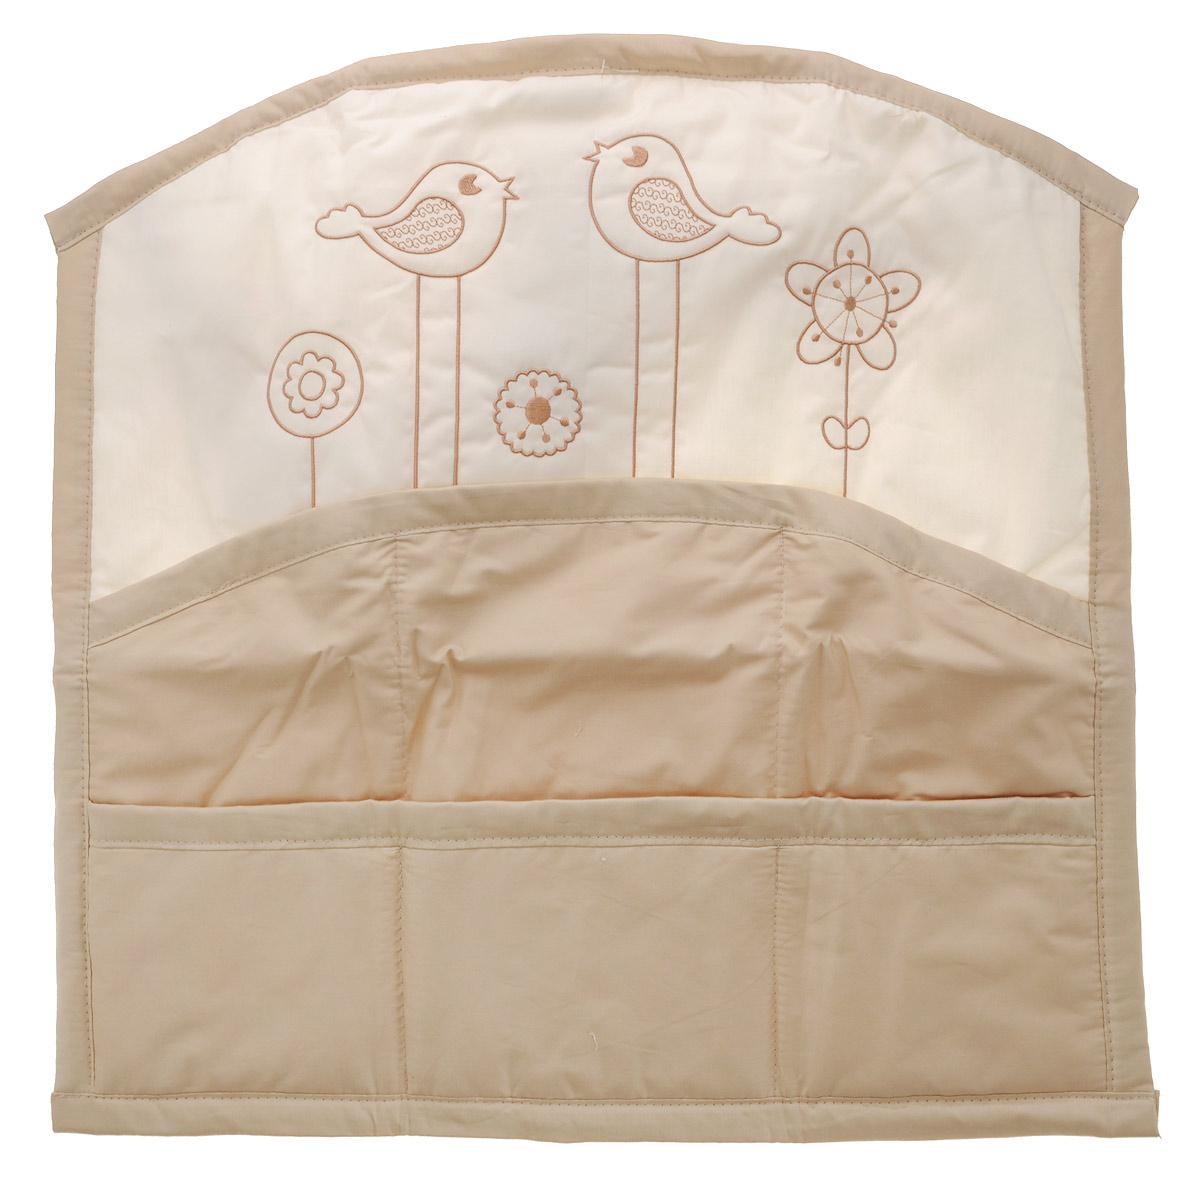 Карман на кроватку Fairy  Волшебная полянка , цвет: белый, бежевый, 59 см х 60 см -  Бортики, бамперы